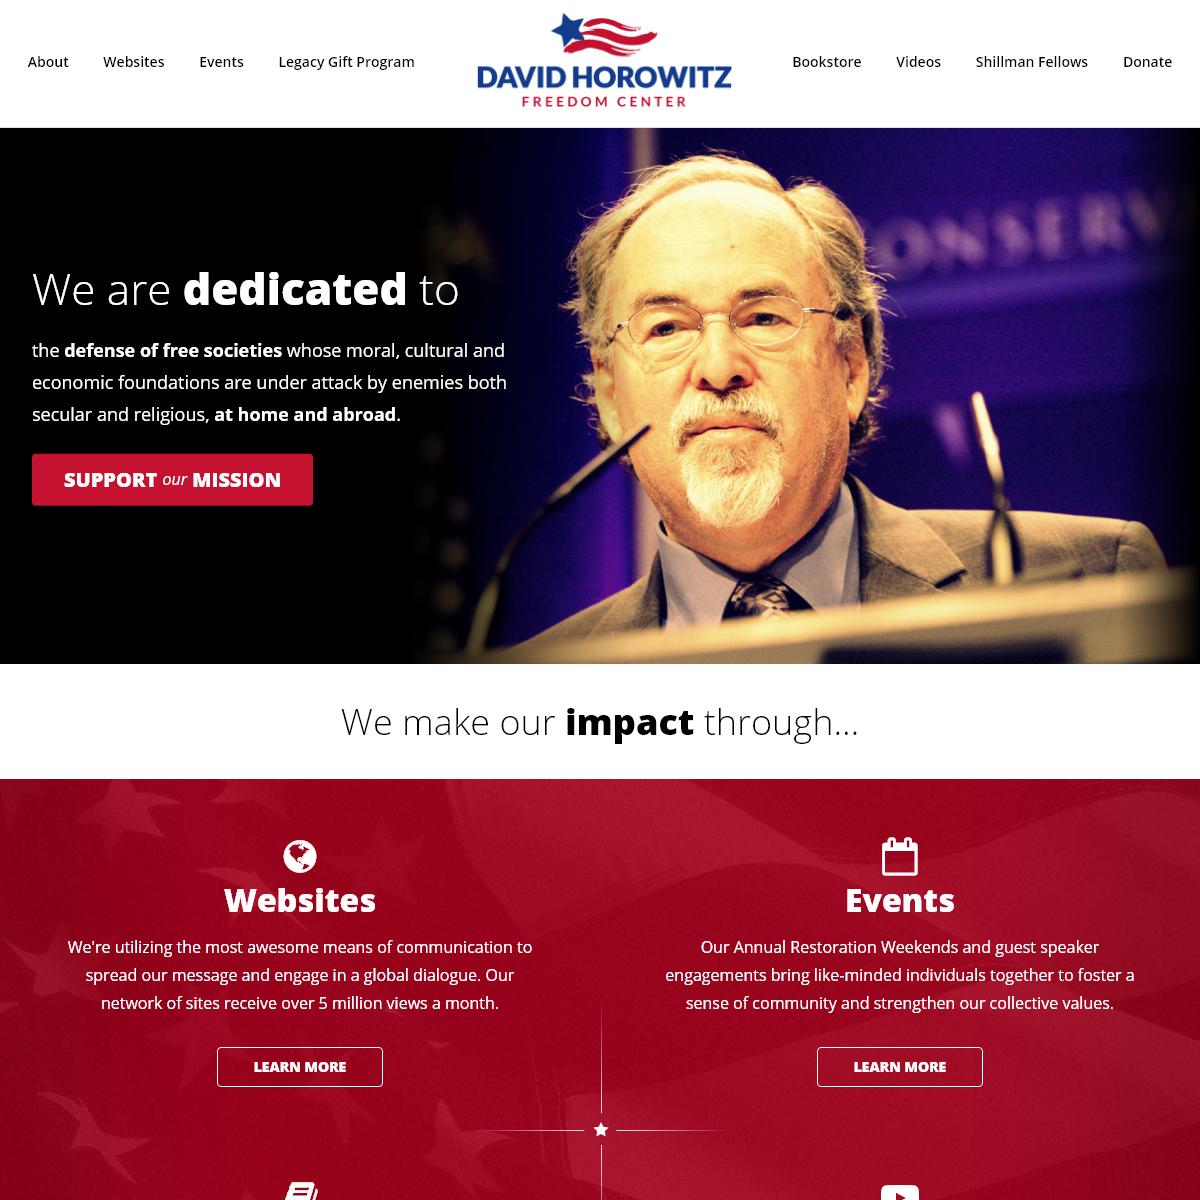 David Horwitz Freedom Center